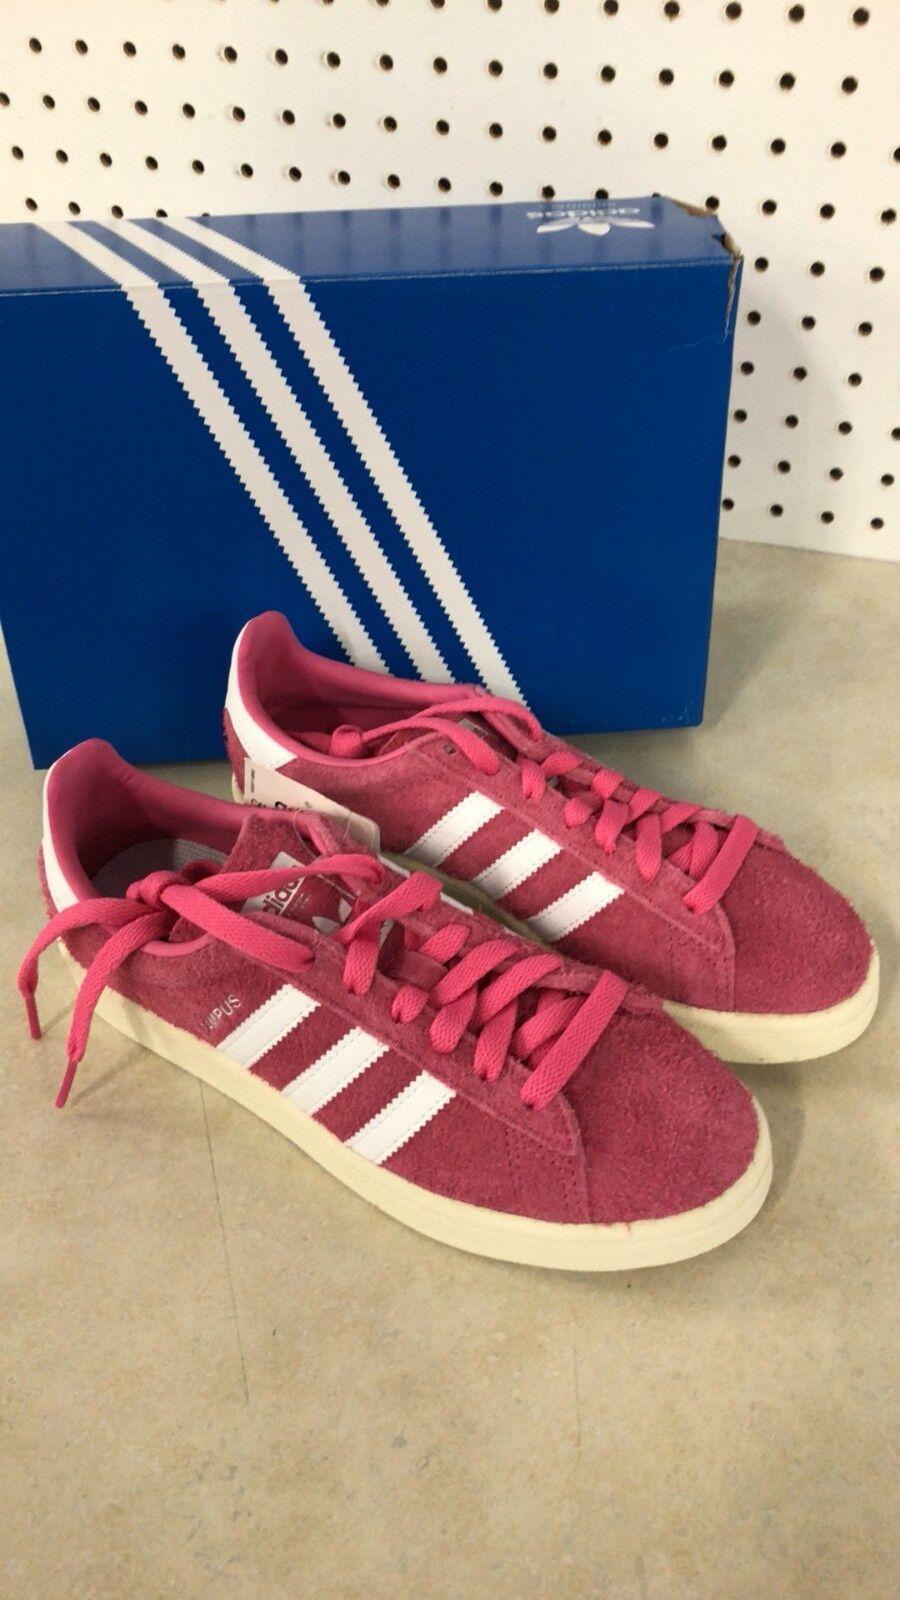 Adidas Campus BZ0069 Uomo US 5 Pink White Suede New Free Shipping